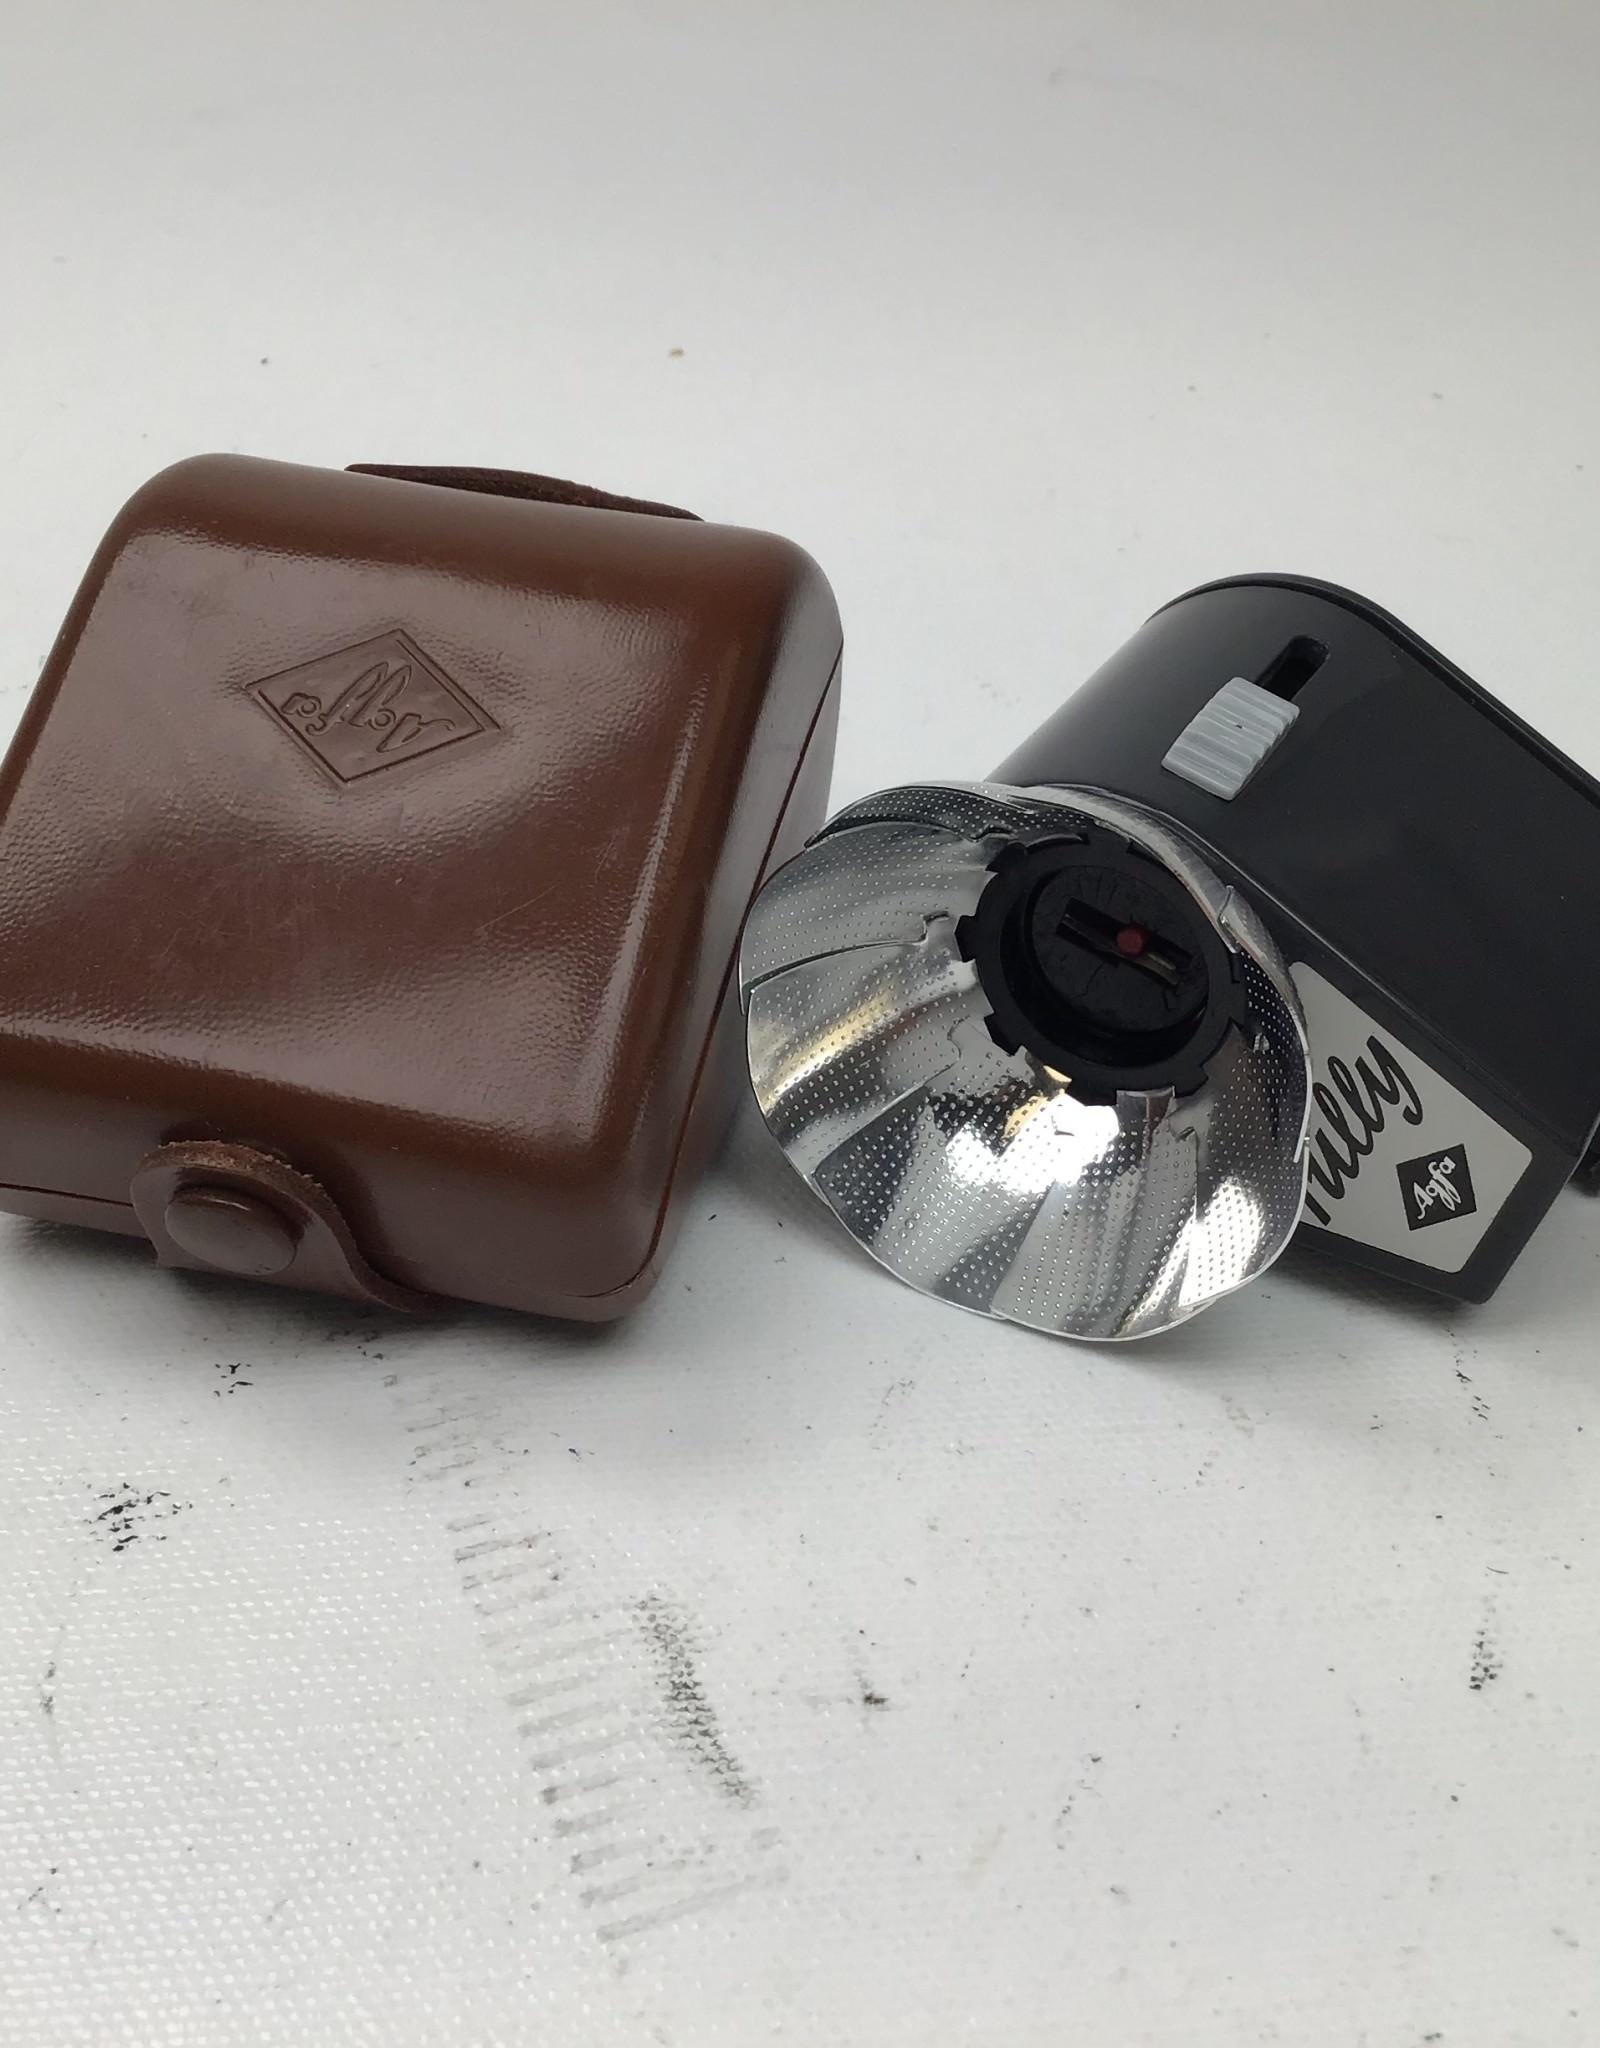 agfa Agfa Tully Flash Bulb Reflector with Case Used EX